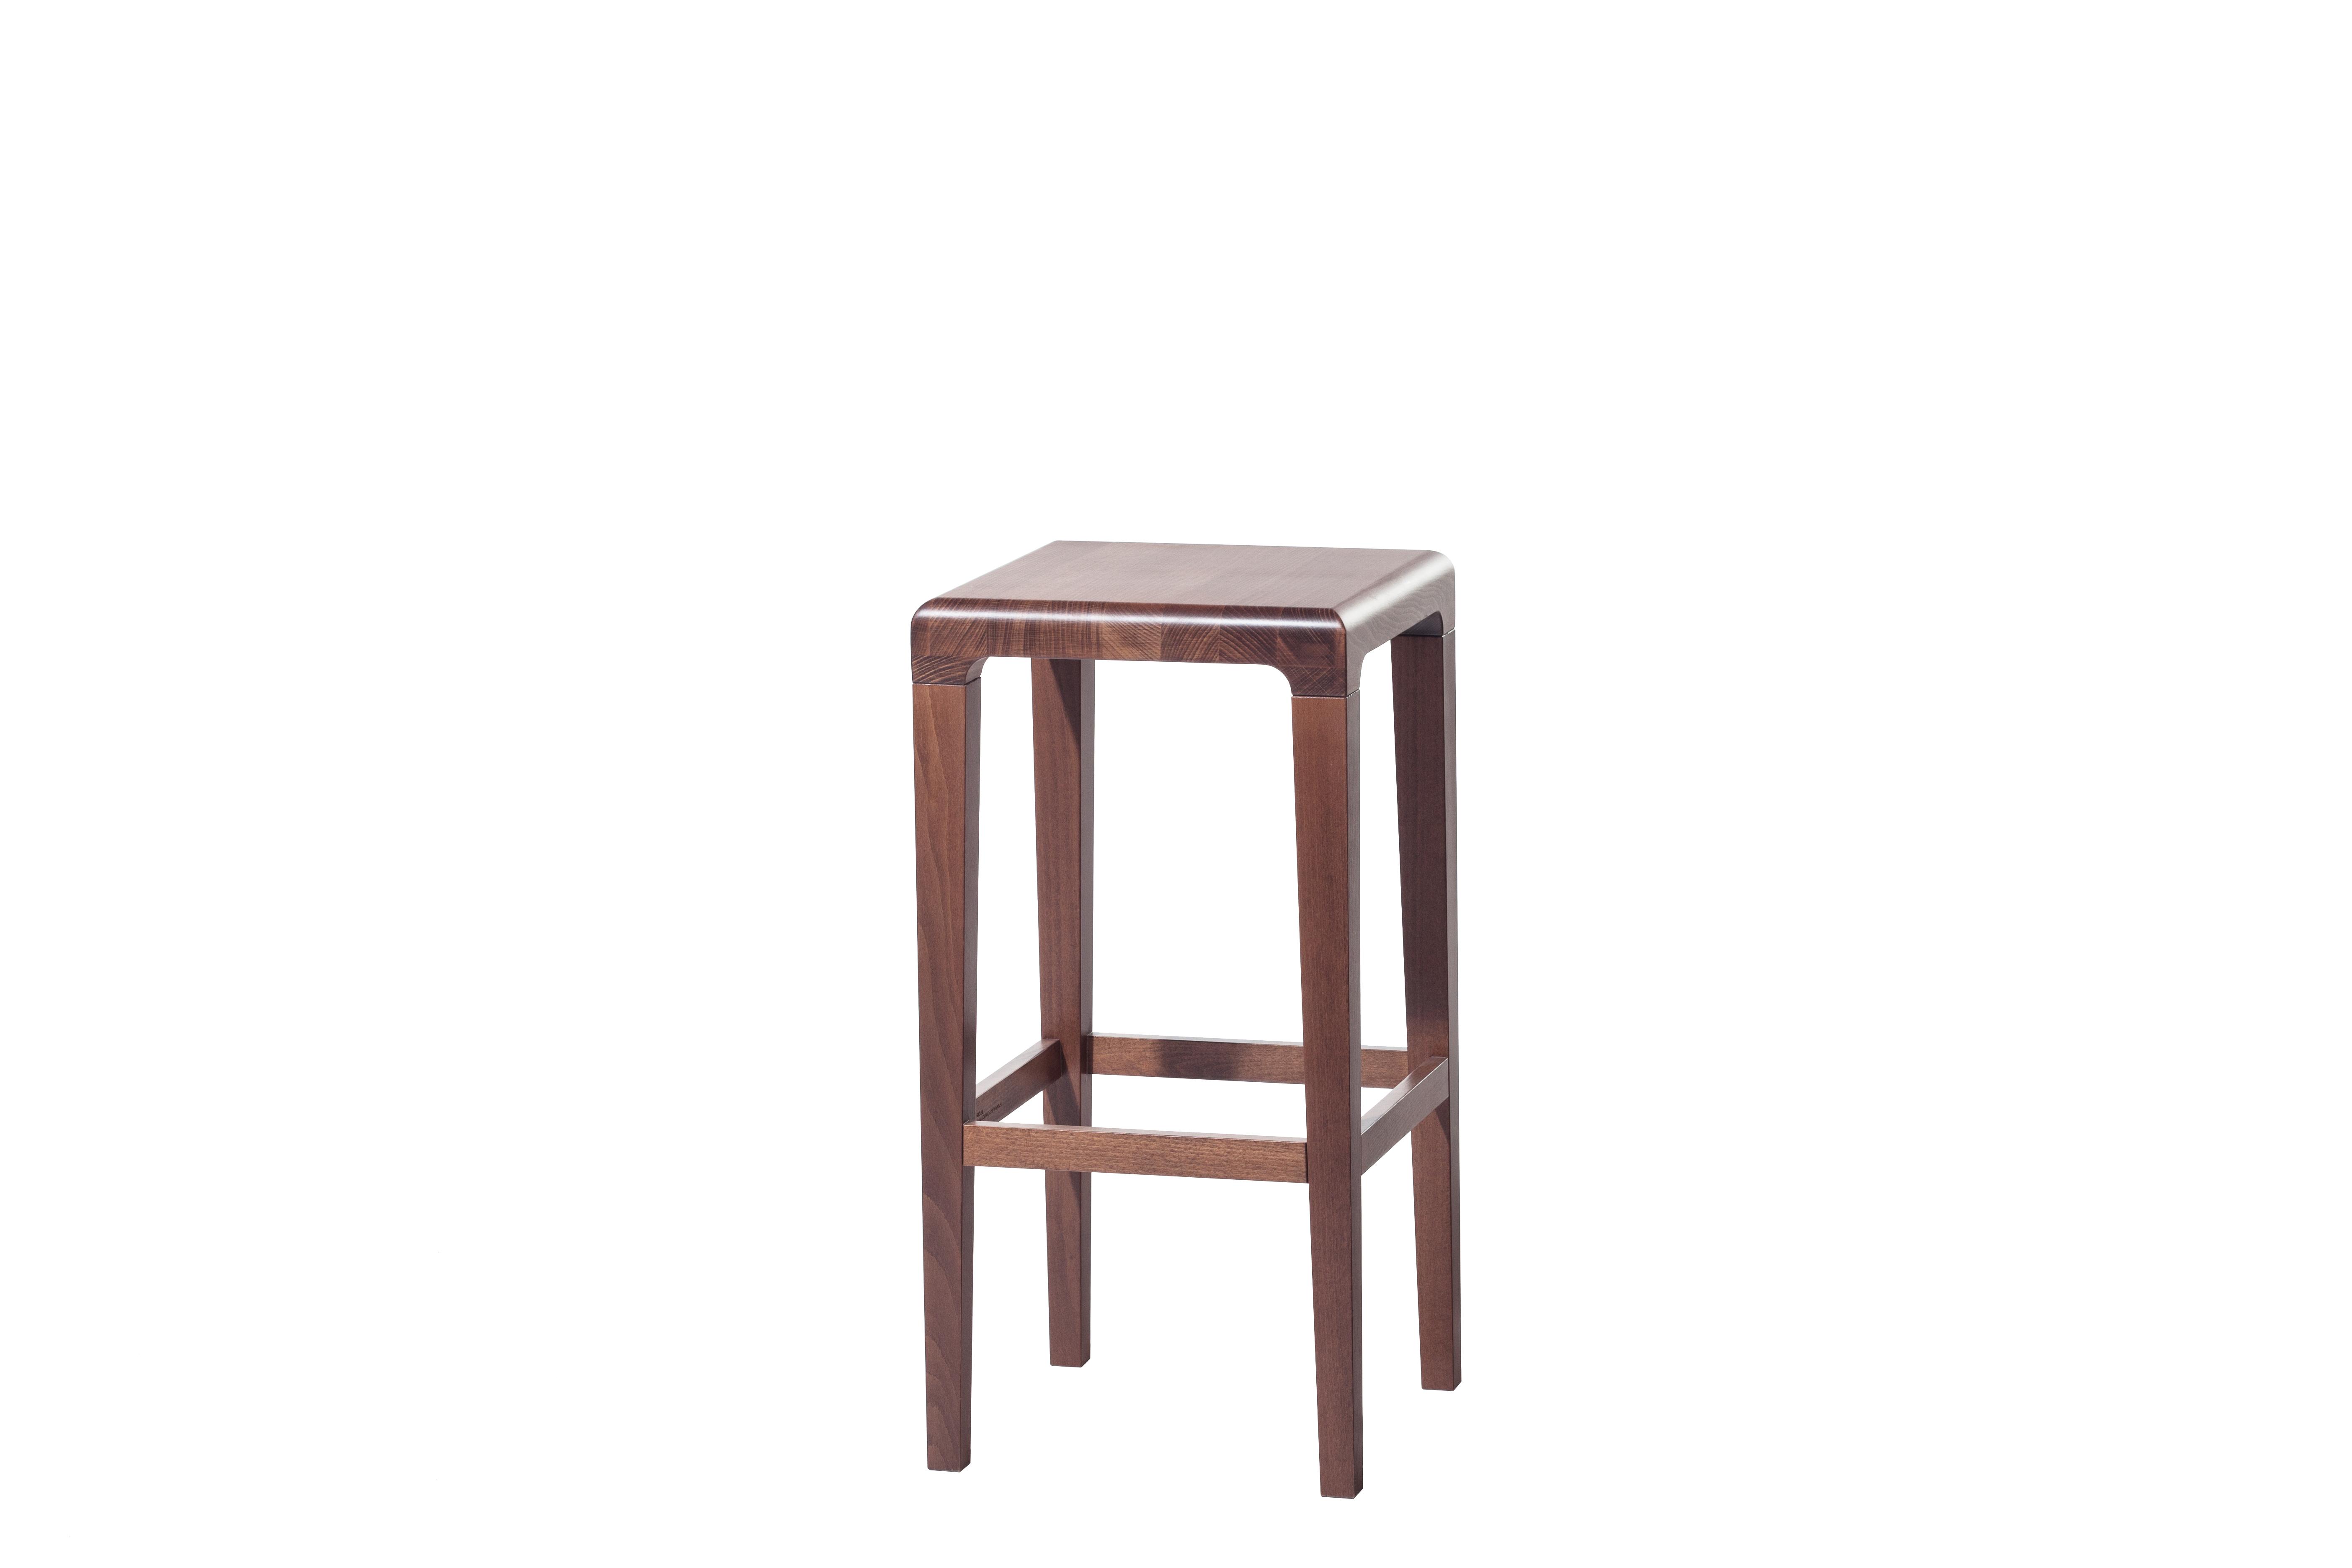 Scaun din lemn de stejar Rioja Brown Small l32xA32xH64 cm